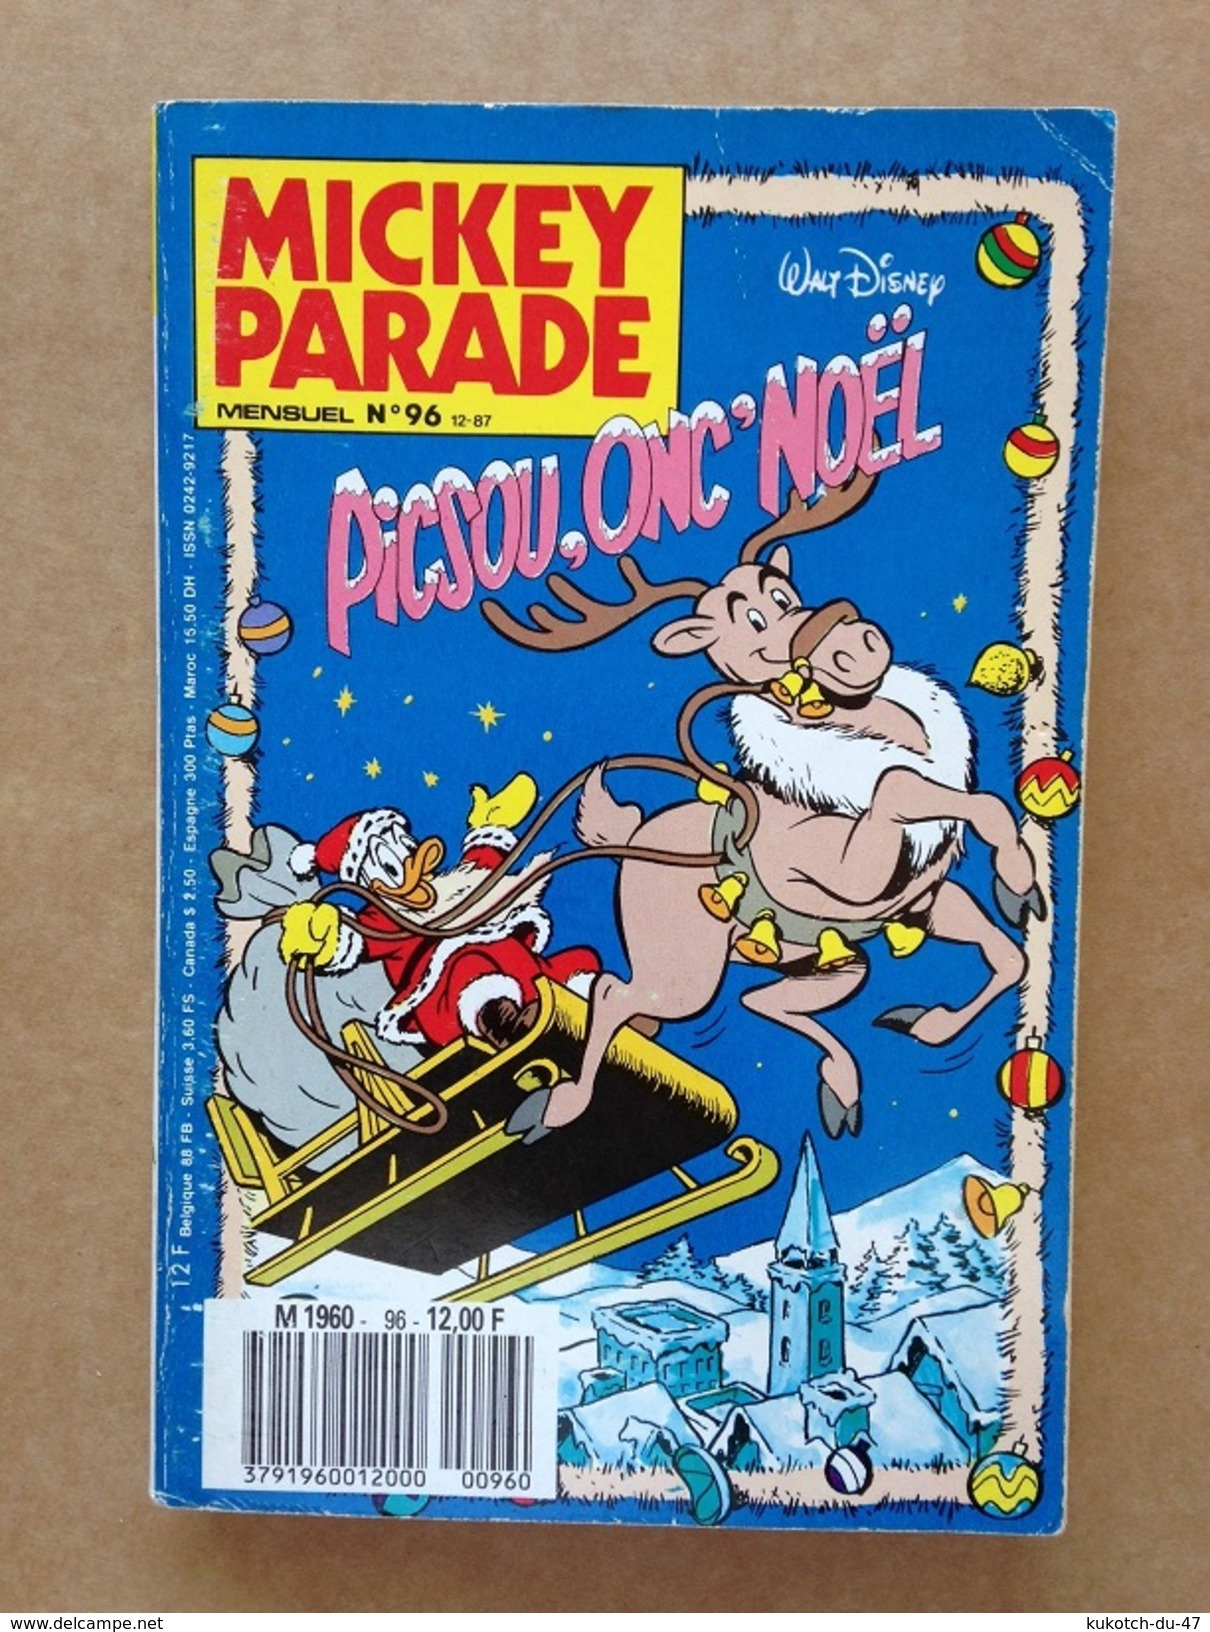 Disney - Mickey Parade - Année 1987 ° N°96 - Mickey Parade